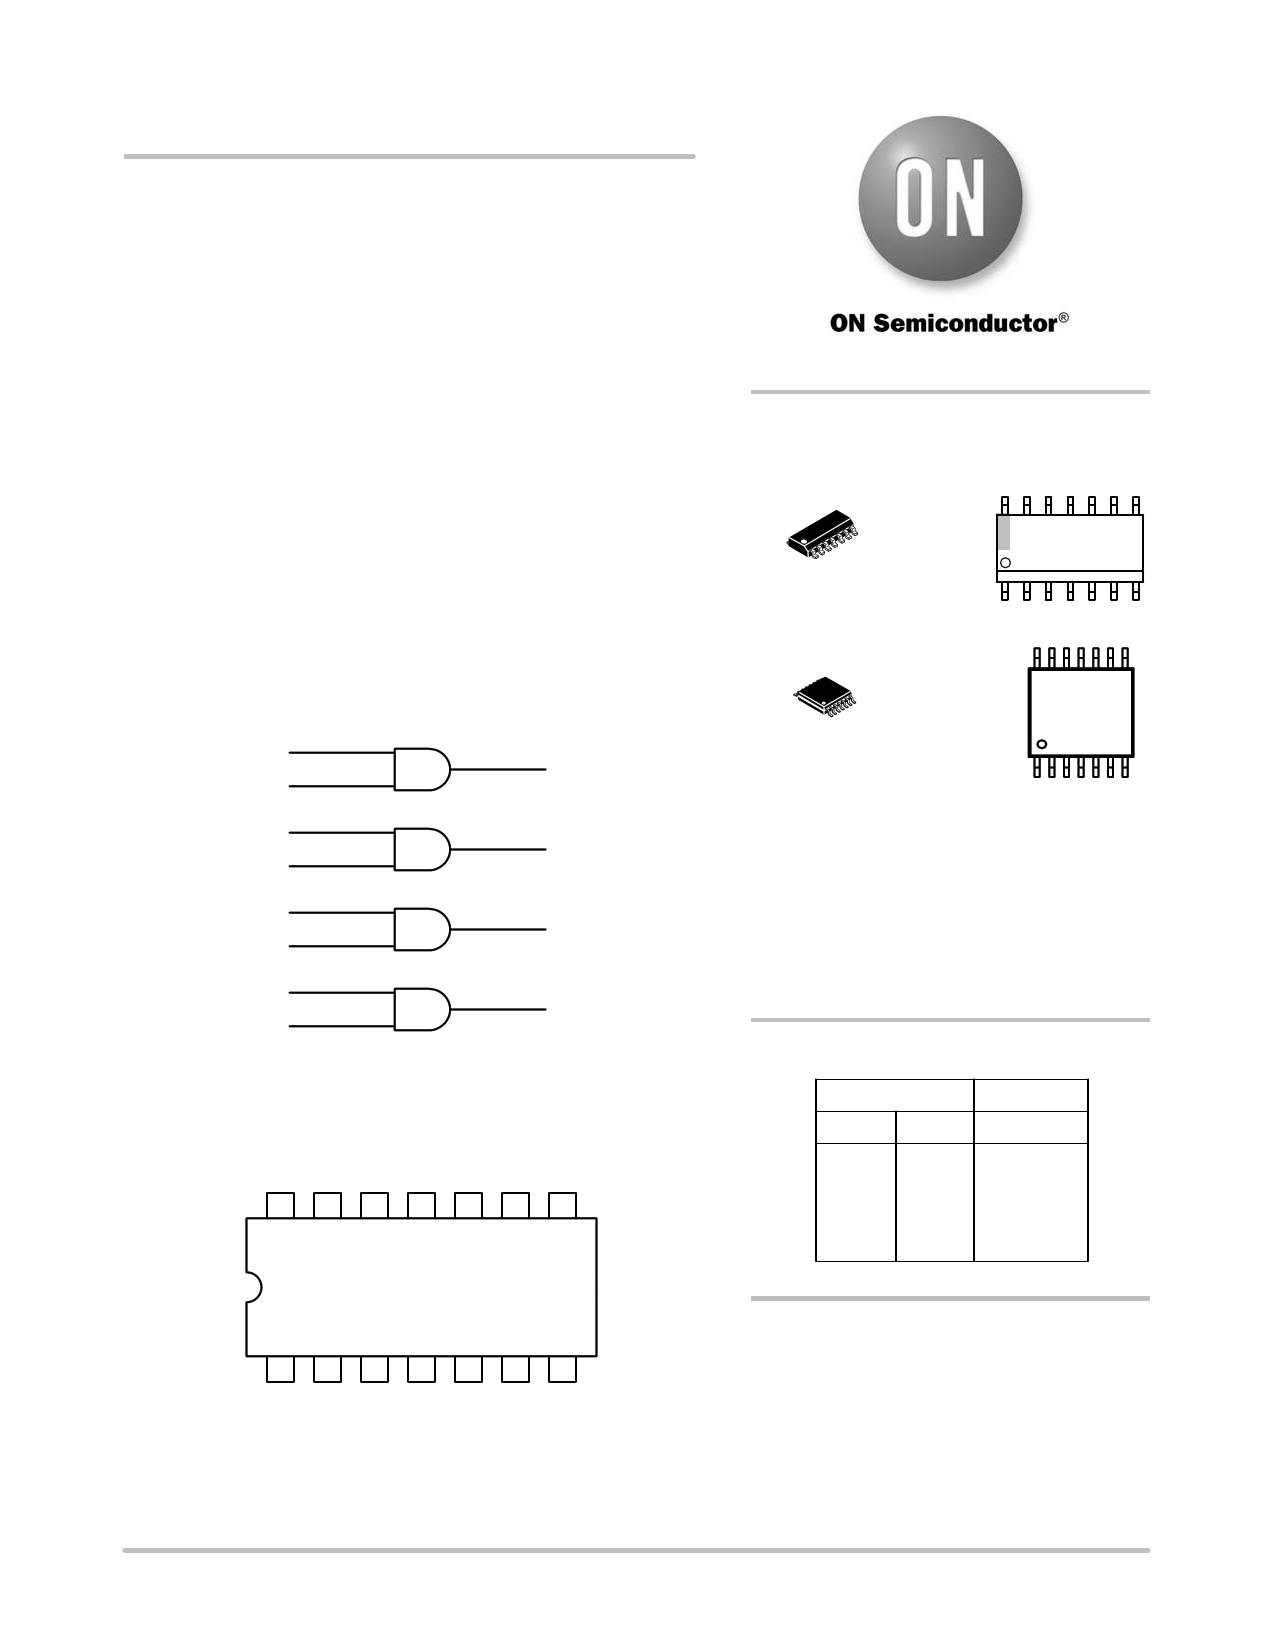 74hc08 pdf  ub370 uc774 ud130 uc2dc ud2b8 - quad 2-input and gate